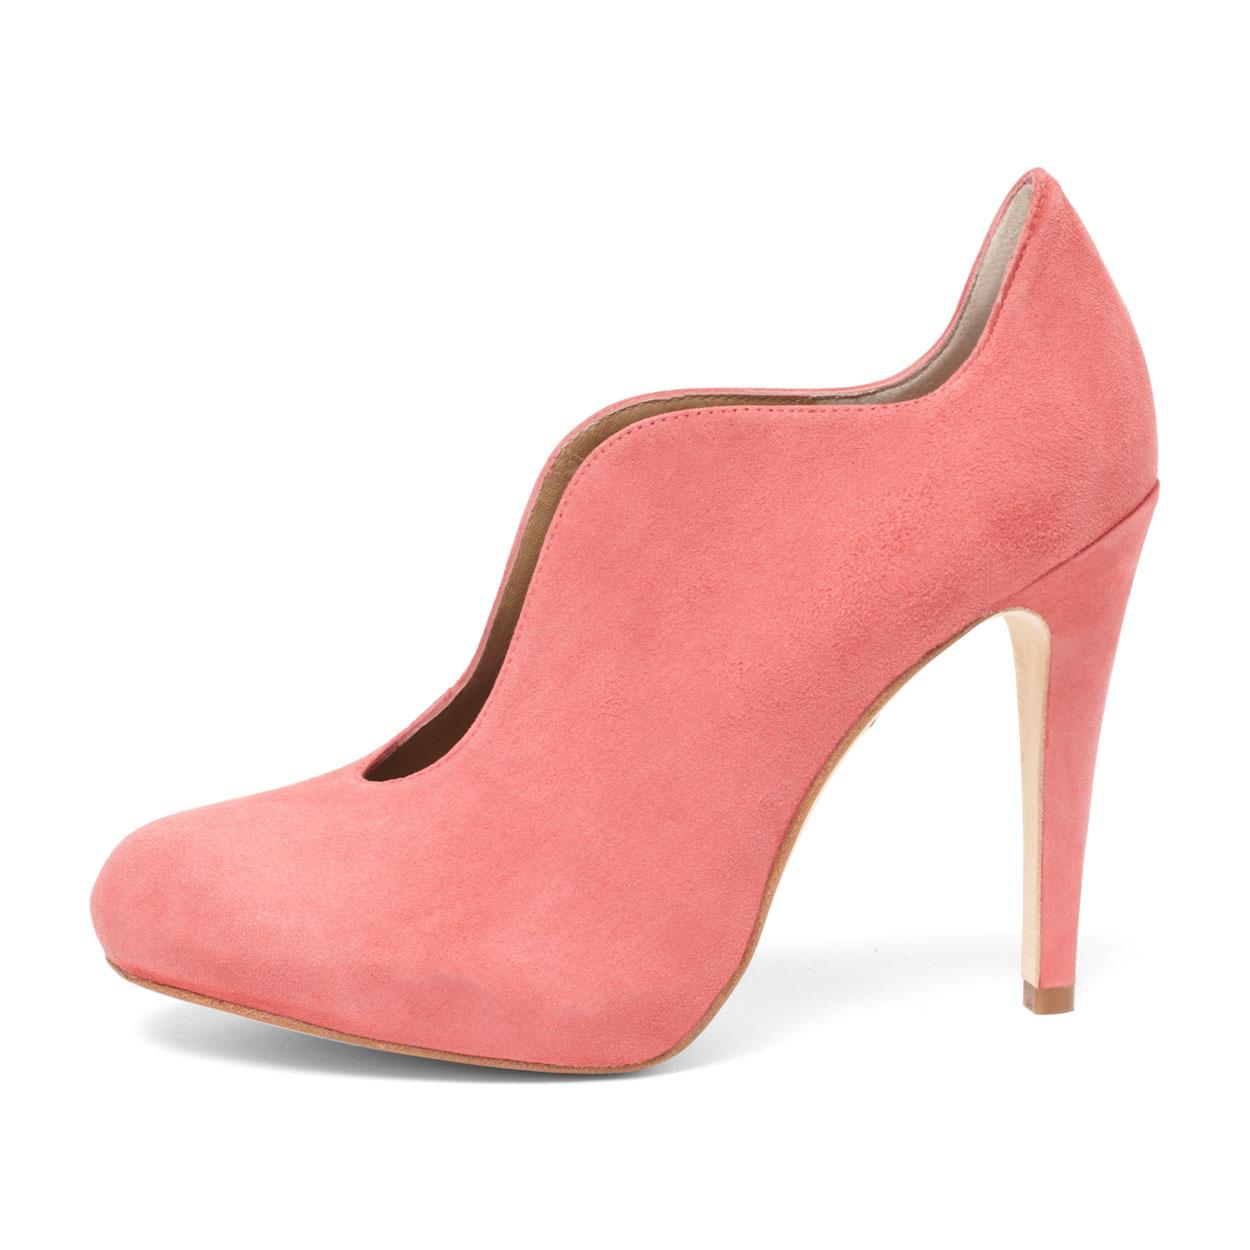 pop-pink-single-heel-shoes-fashion-luxury-cleob.jpg